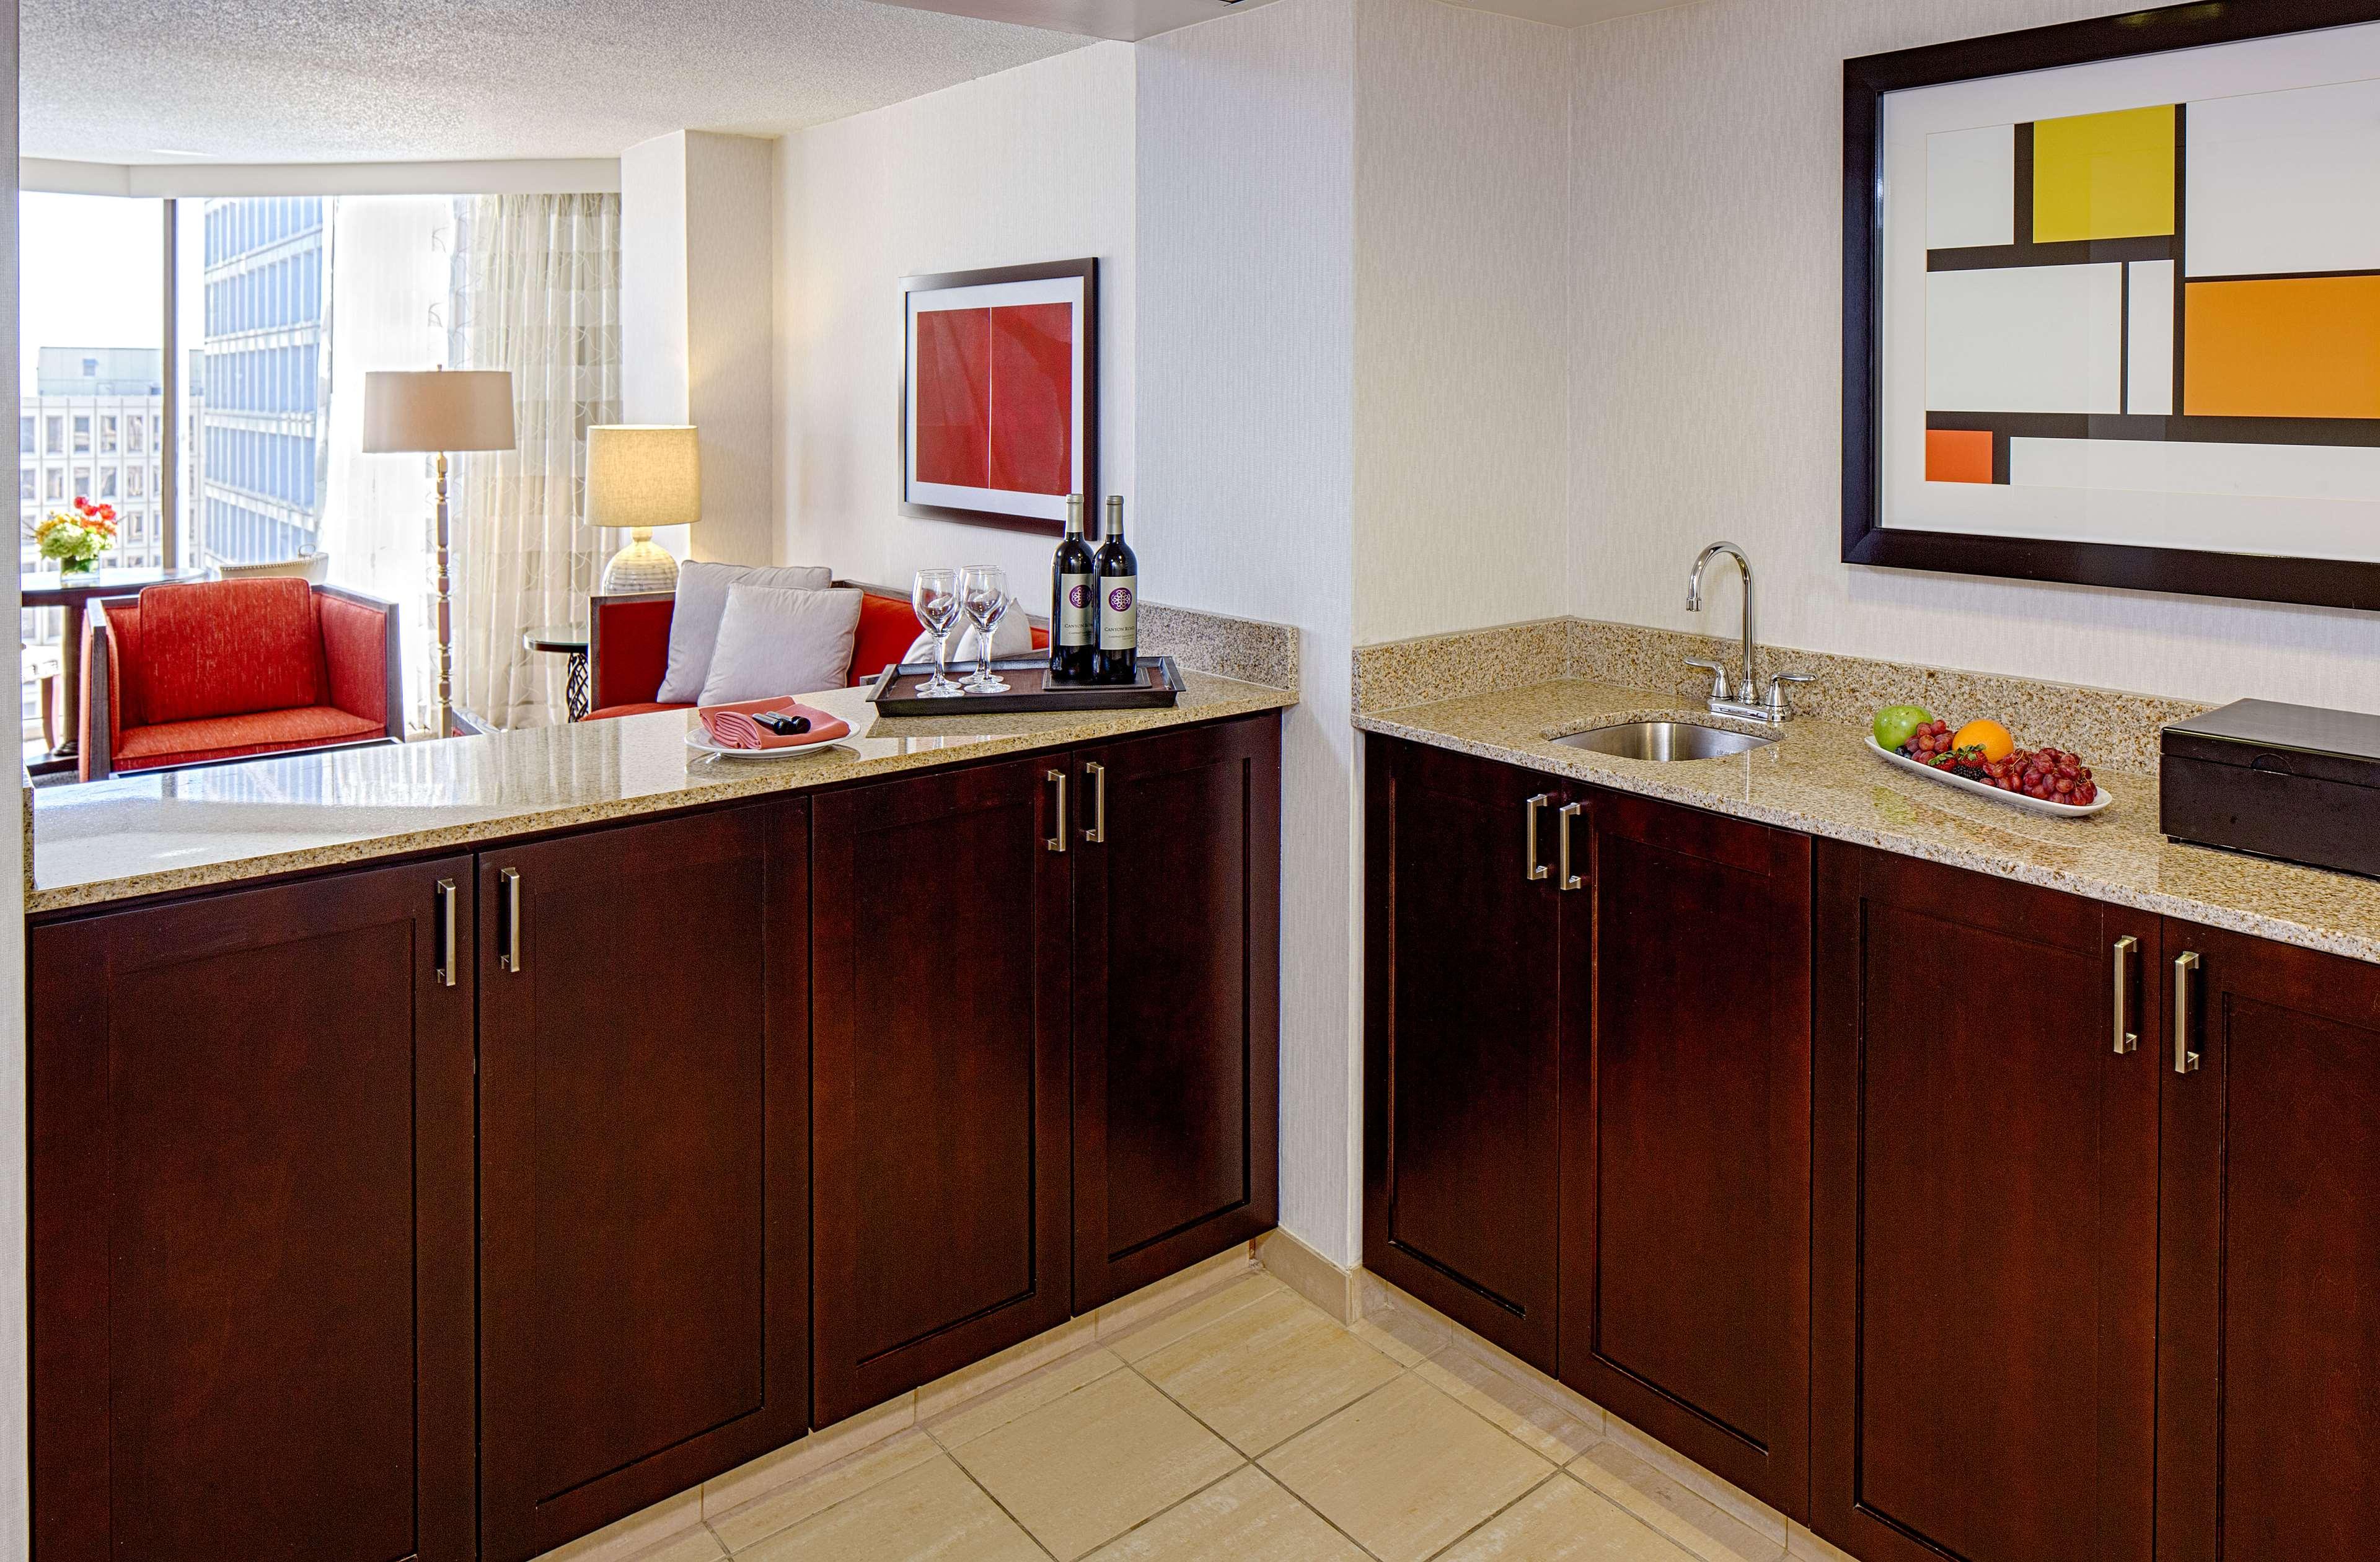 DoubleTree by Hilton Hotel Houston - Greenway Plaza image 27